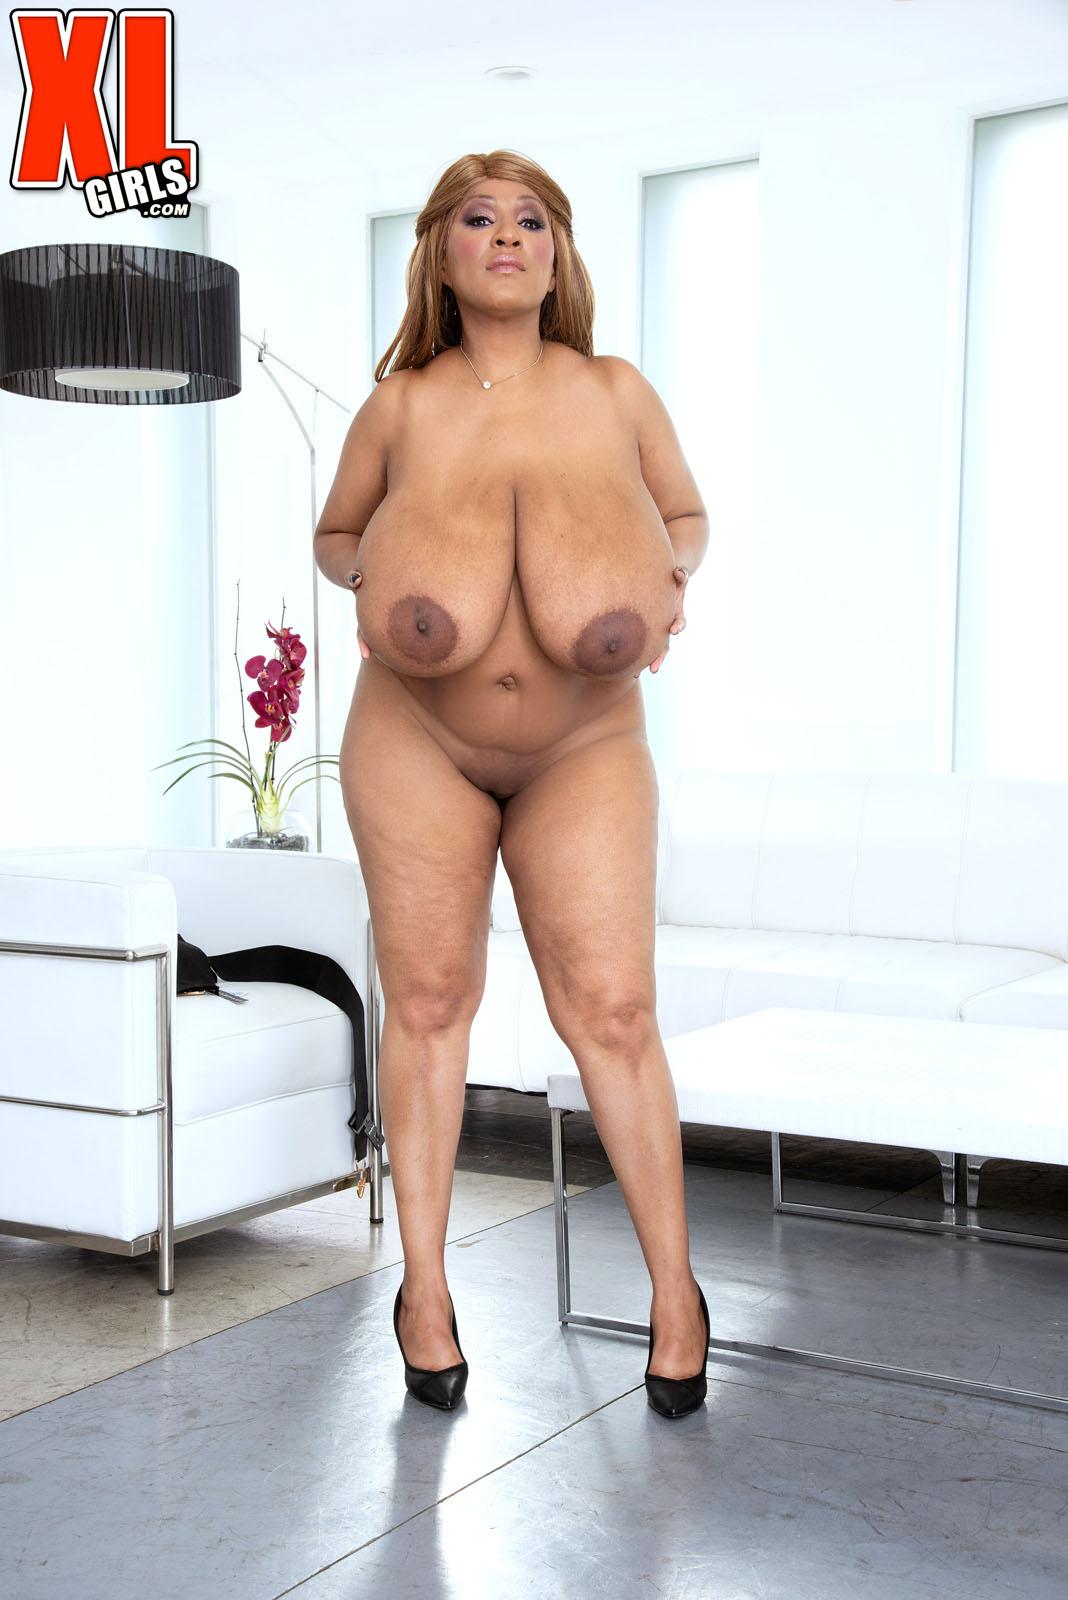 xl girls fat nude women